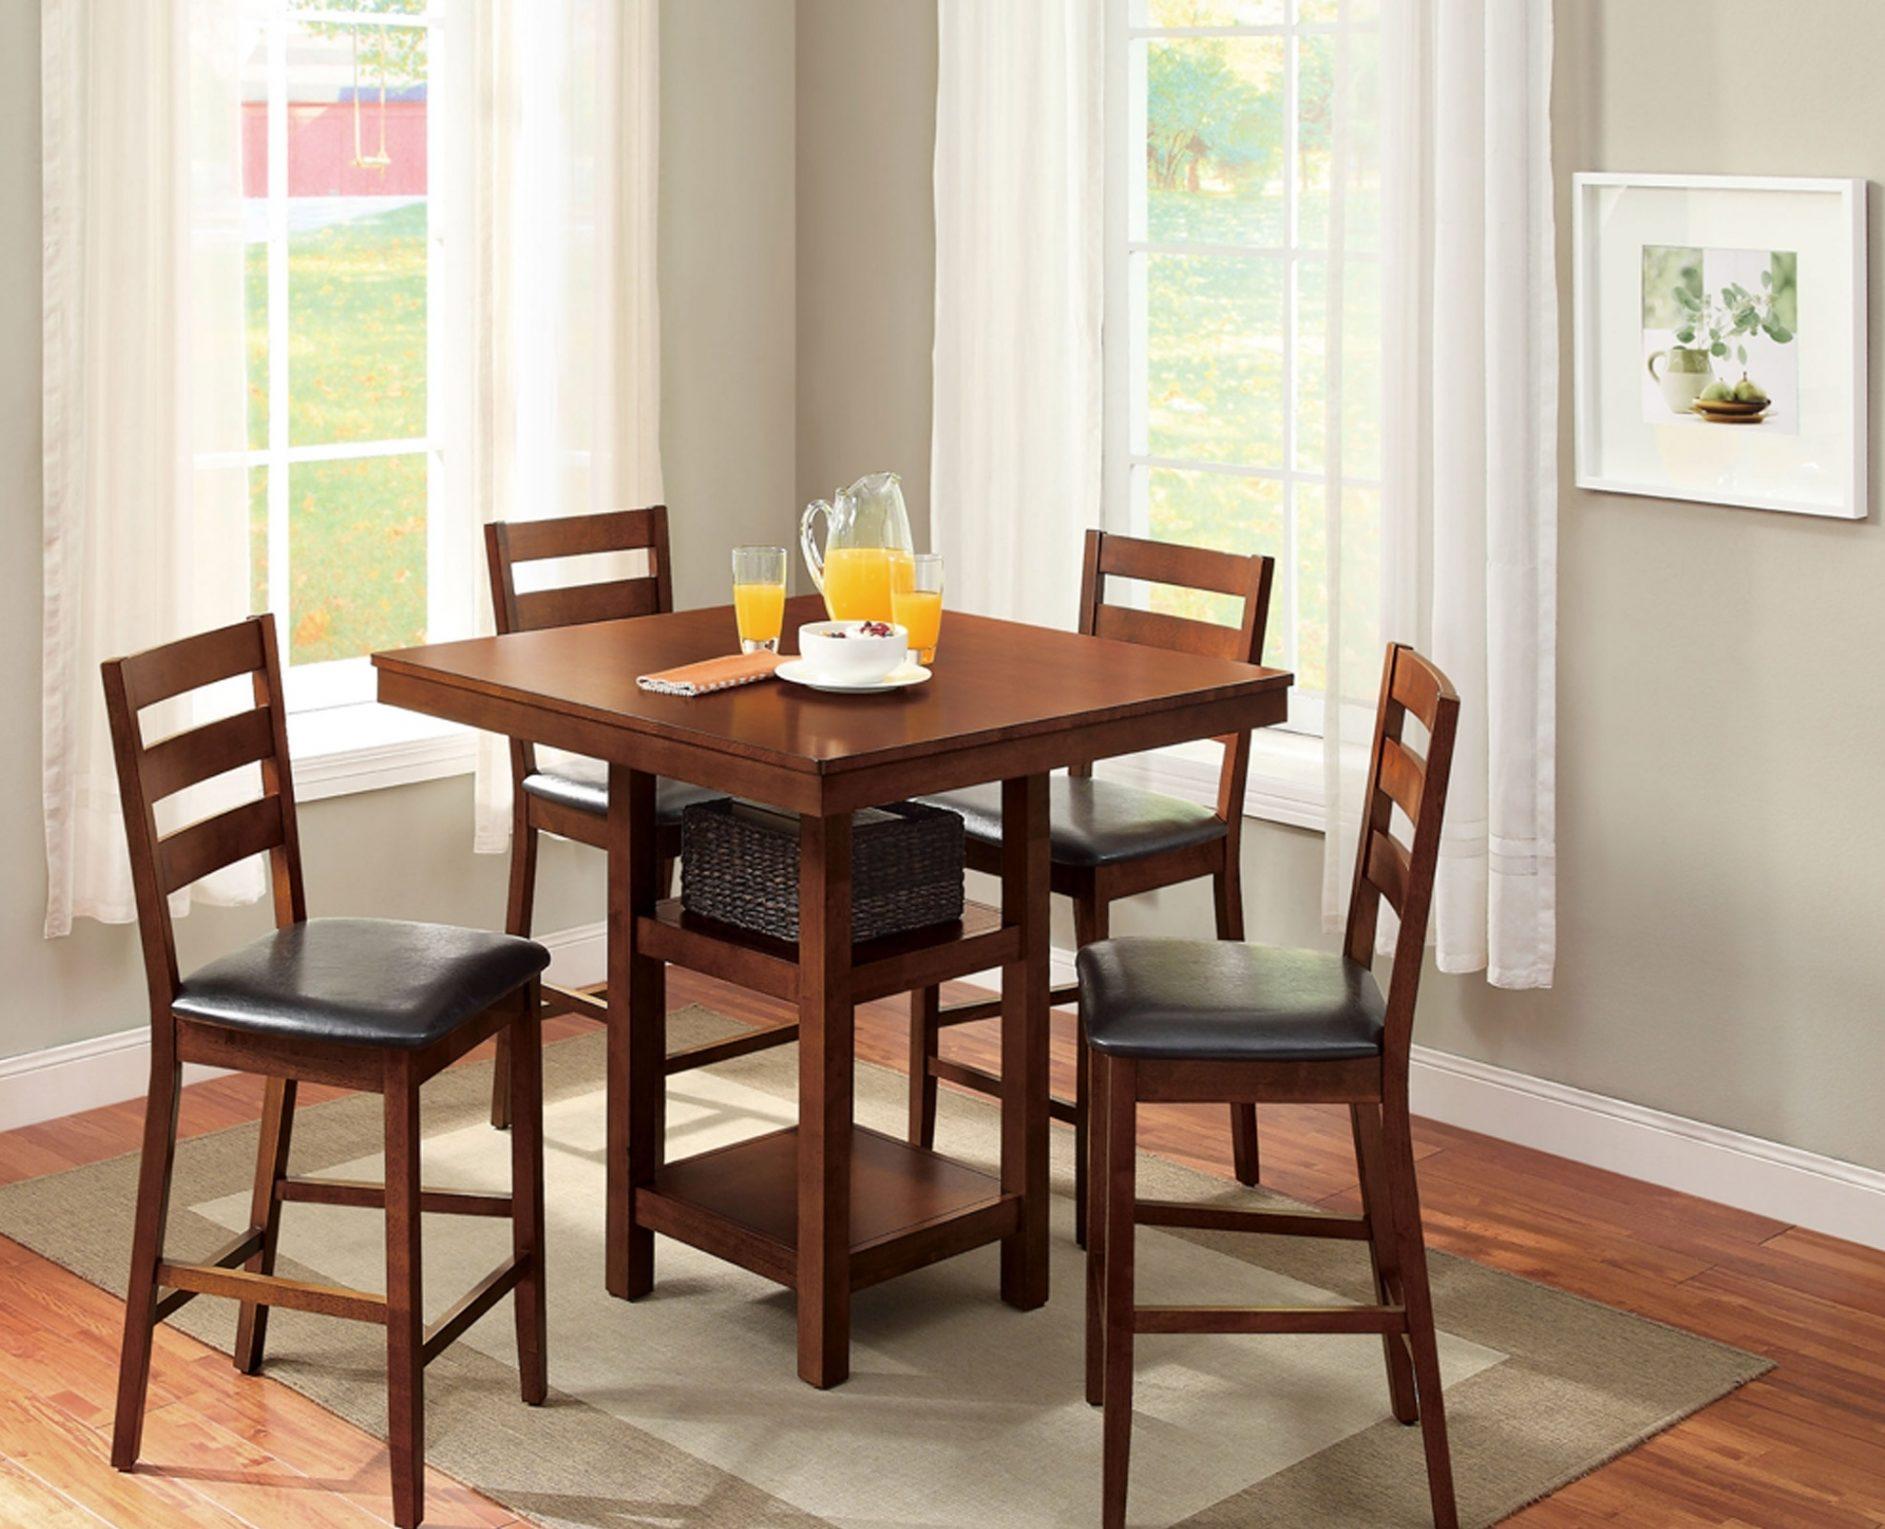 Kitchen & Dining Furniture For Dining Room Furniture